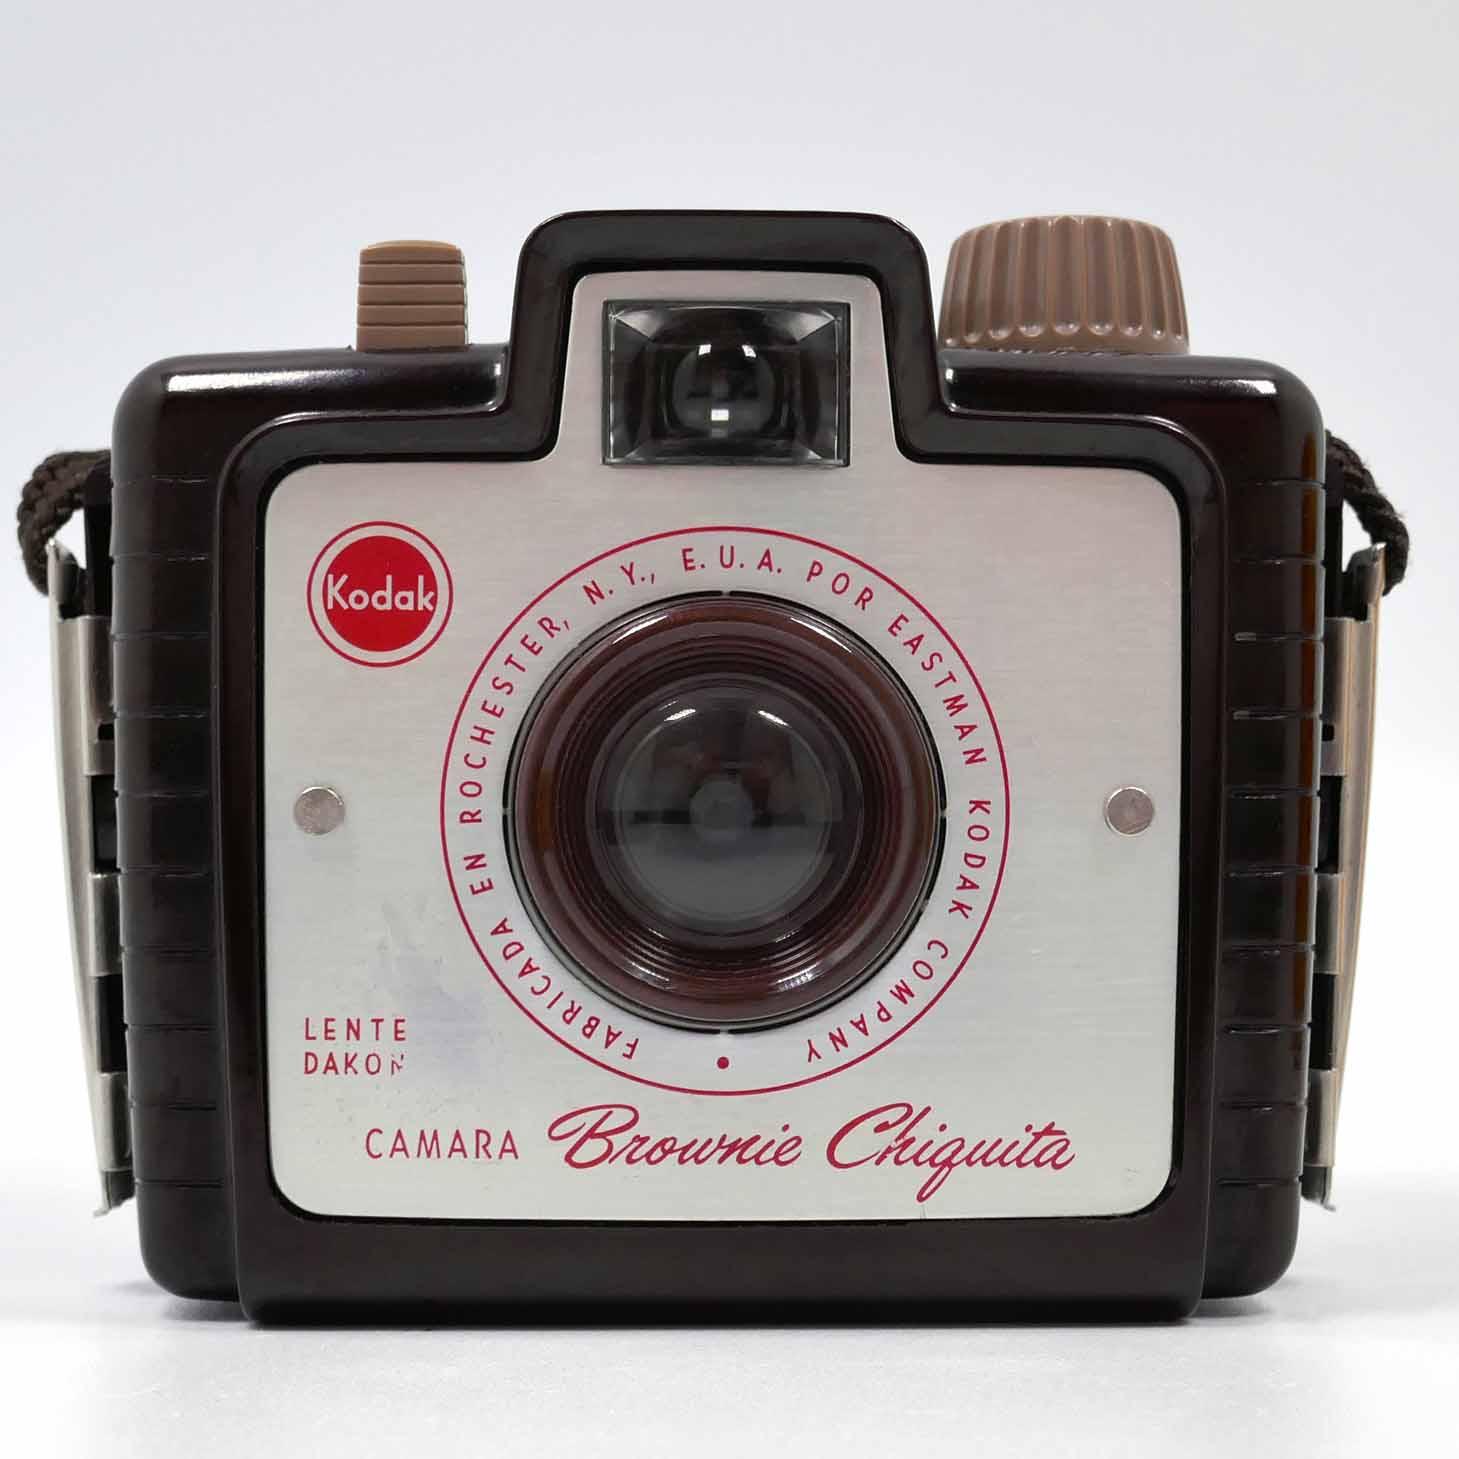 clean-cameras-Kodak-Box-Brownie-Chiquita-01